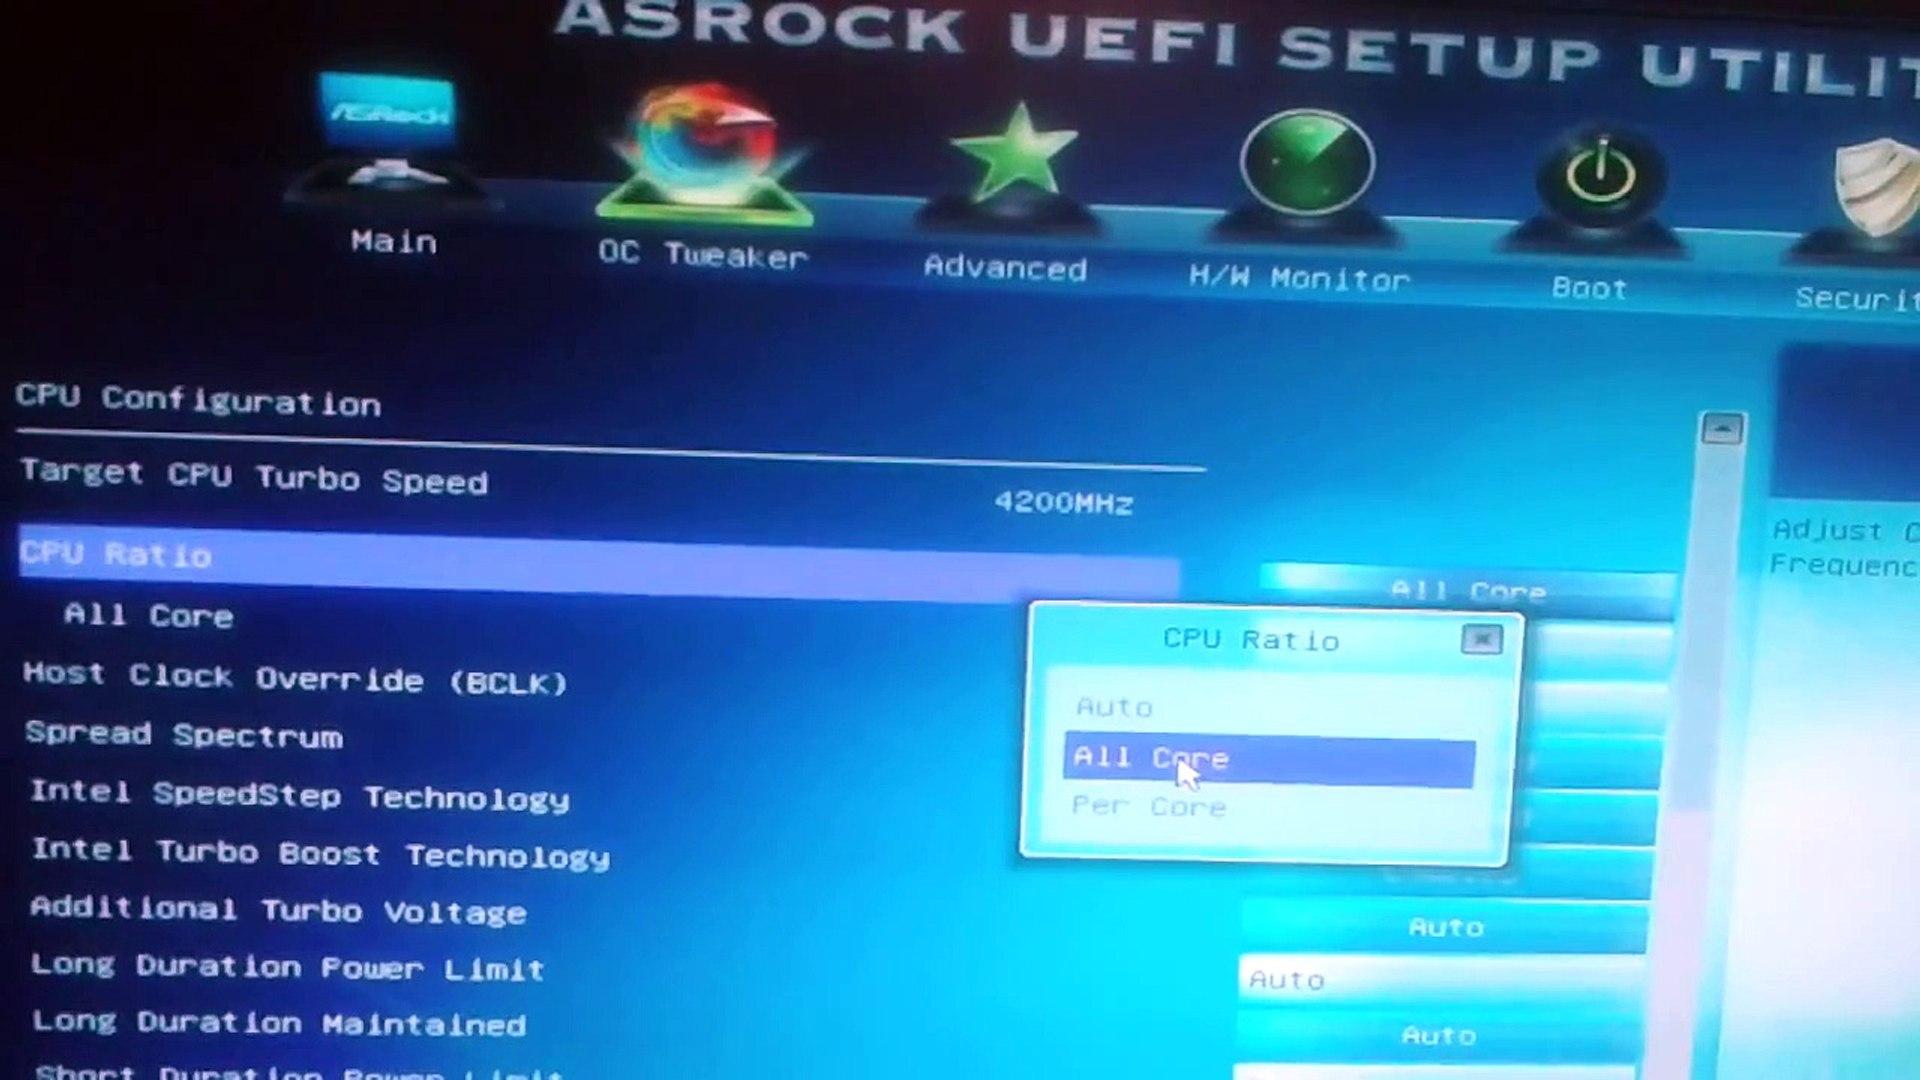 How to overclock i5 3570(Разгон Intel core i5 3570 без k/Оverclocking Intel  Core i5 3570(not k))